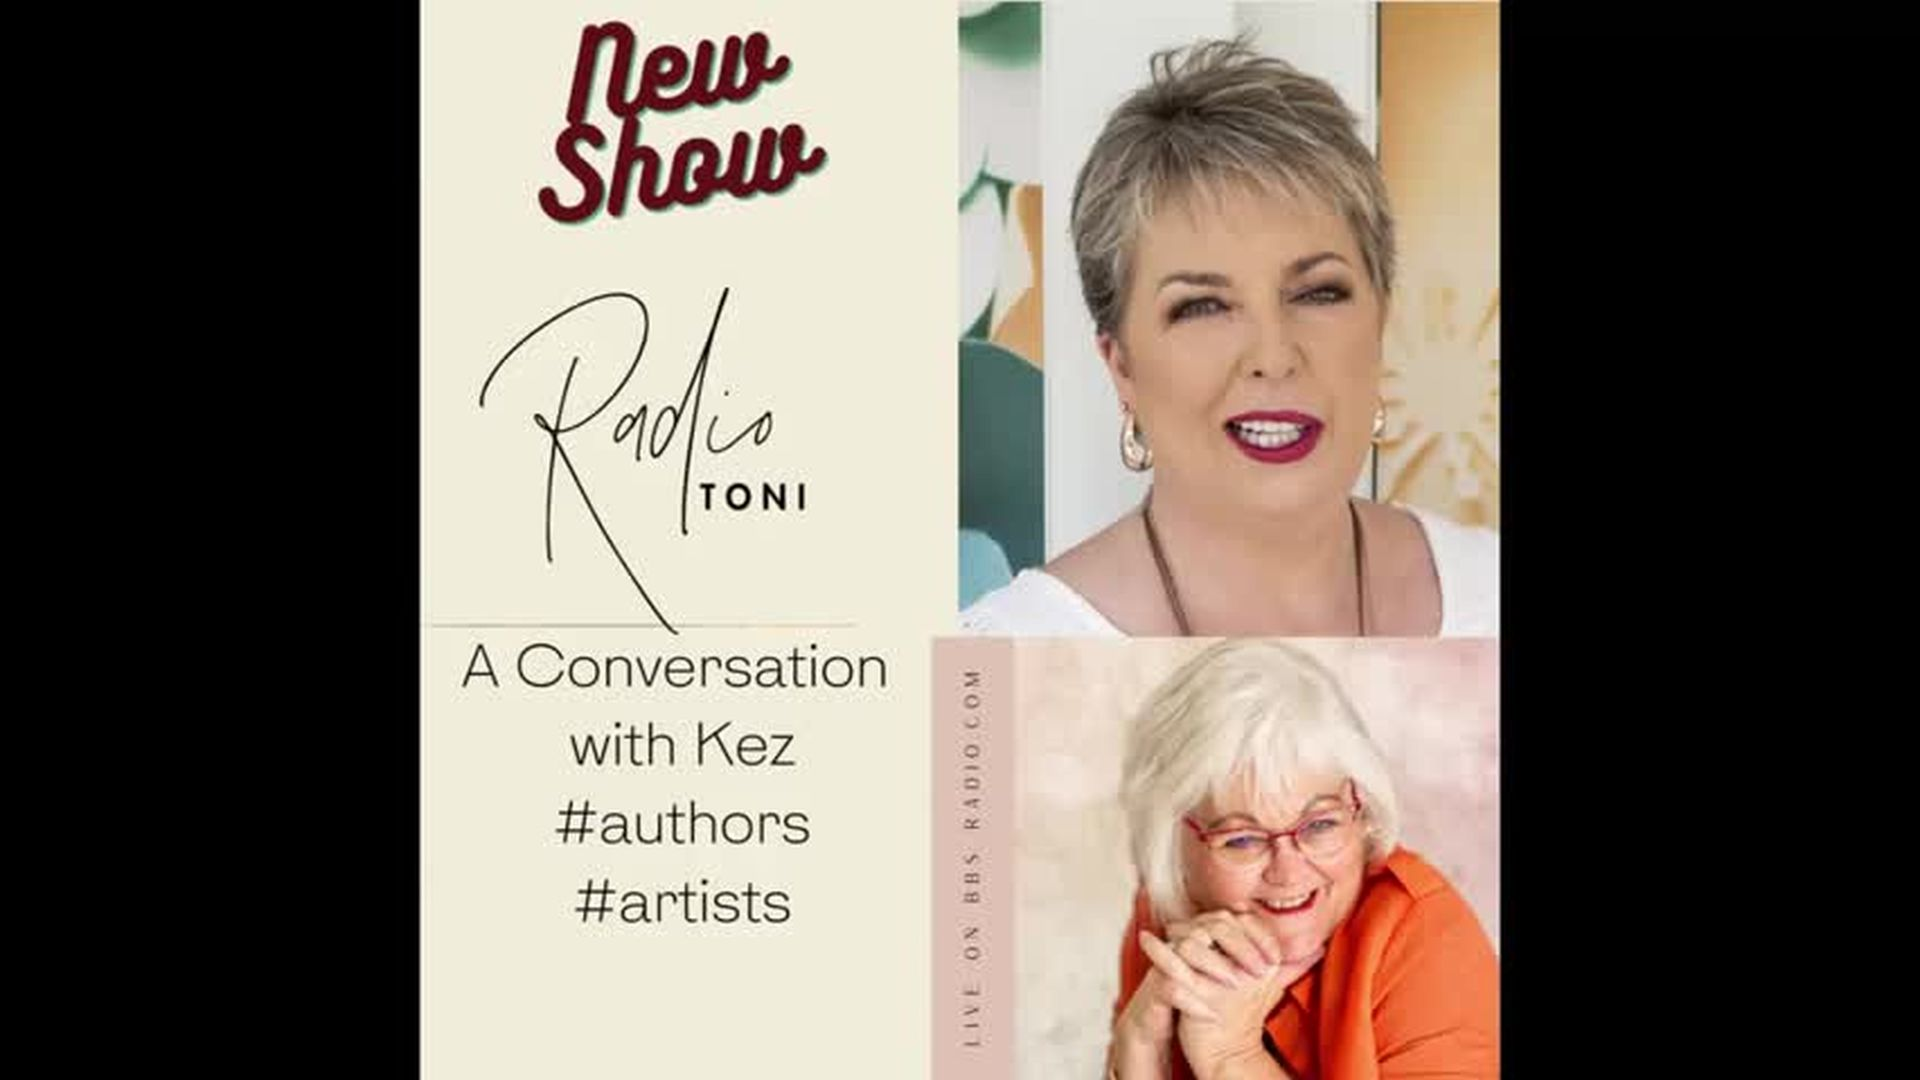 Radio Toni A Conversation with Kez